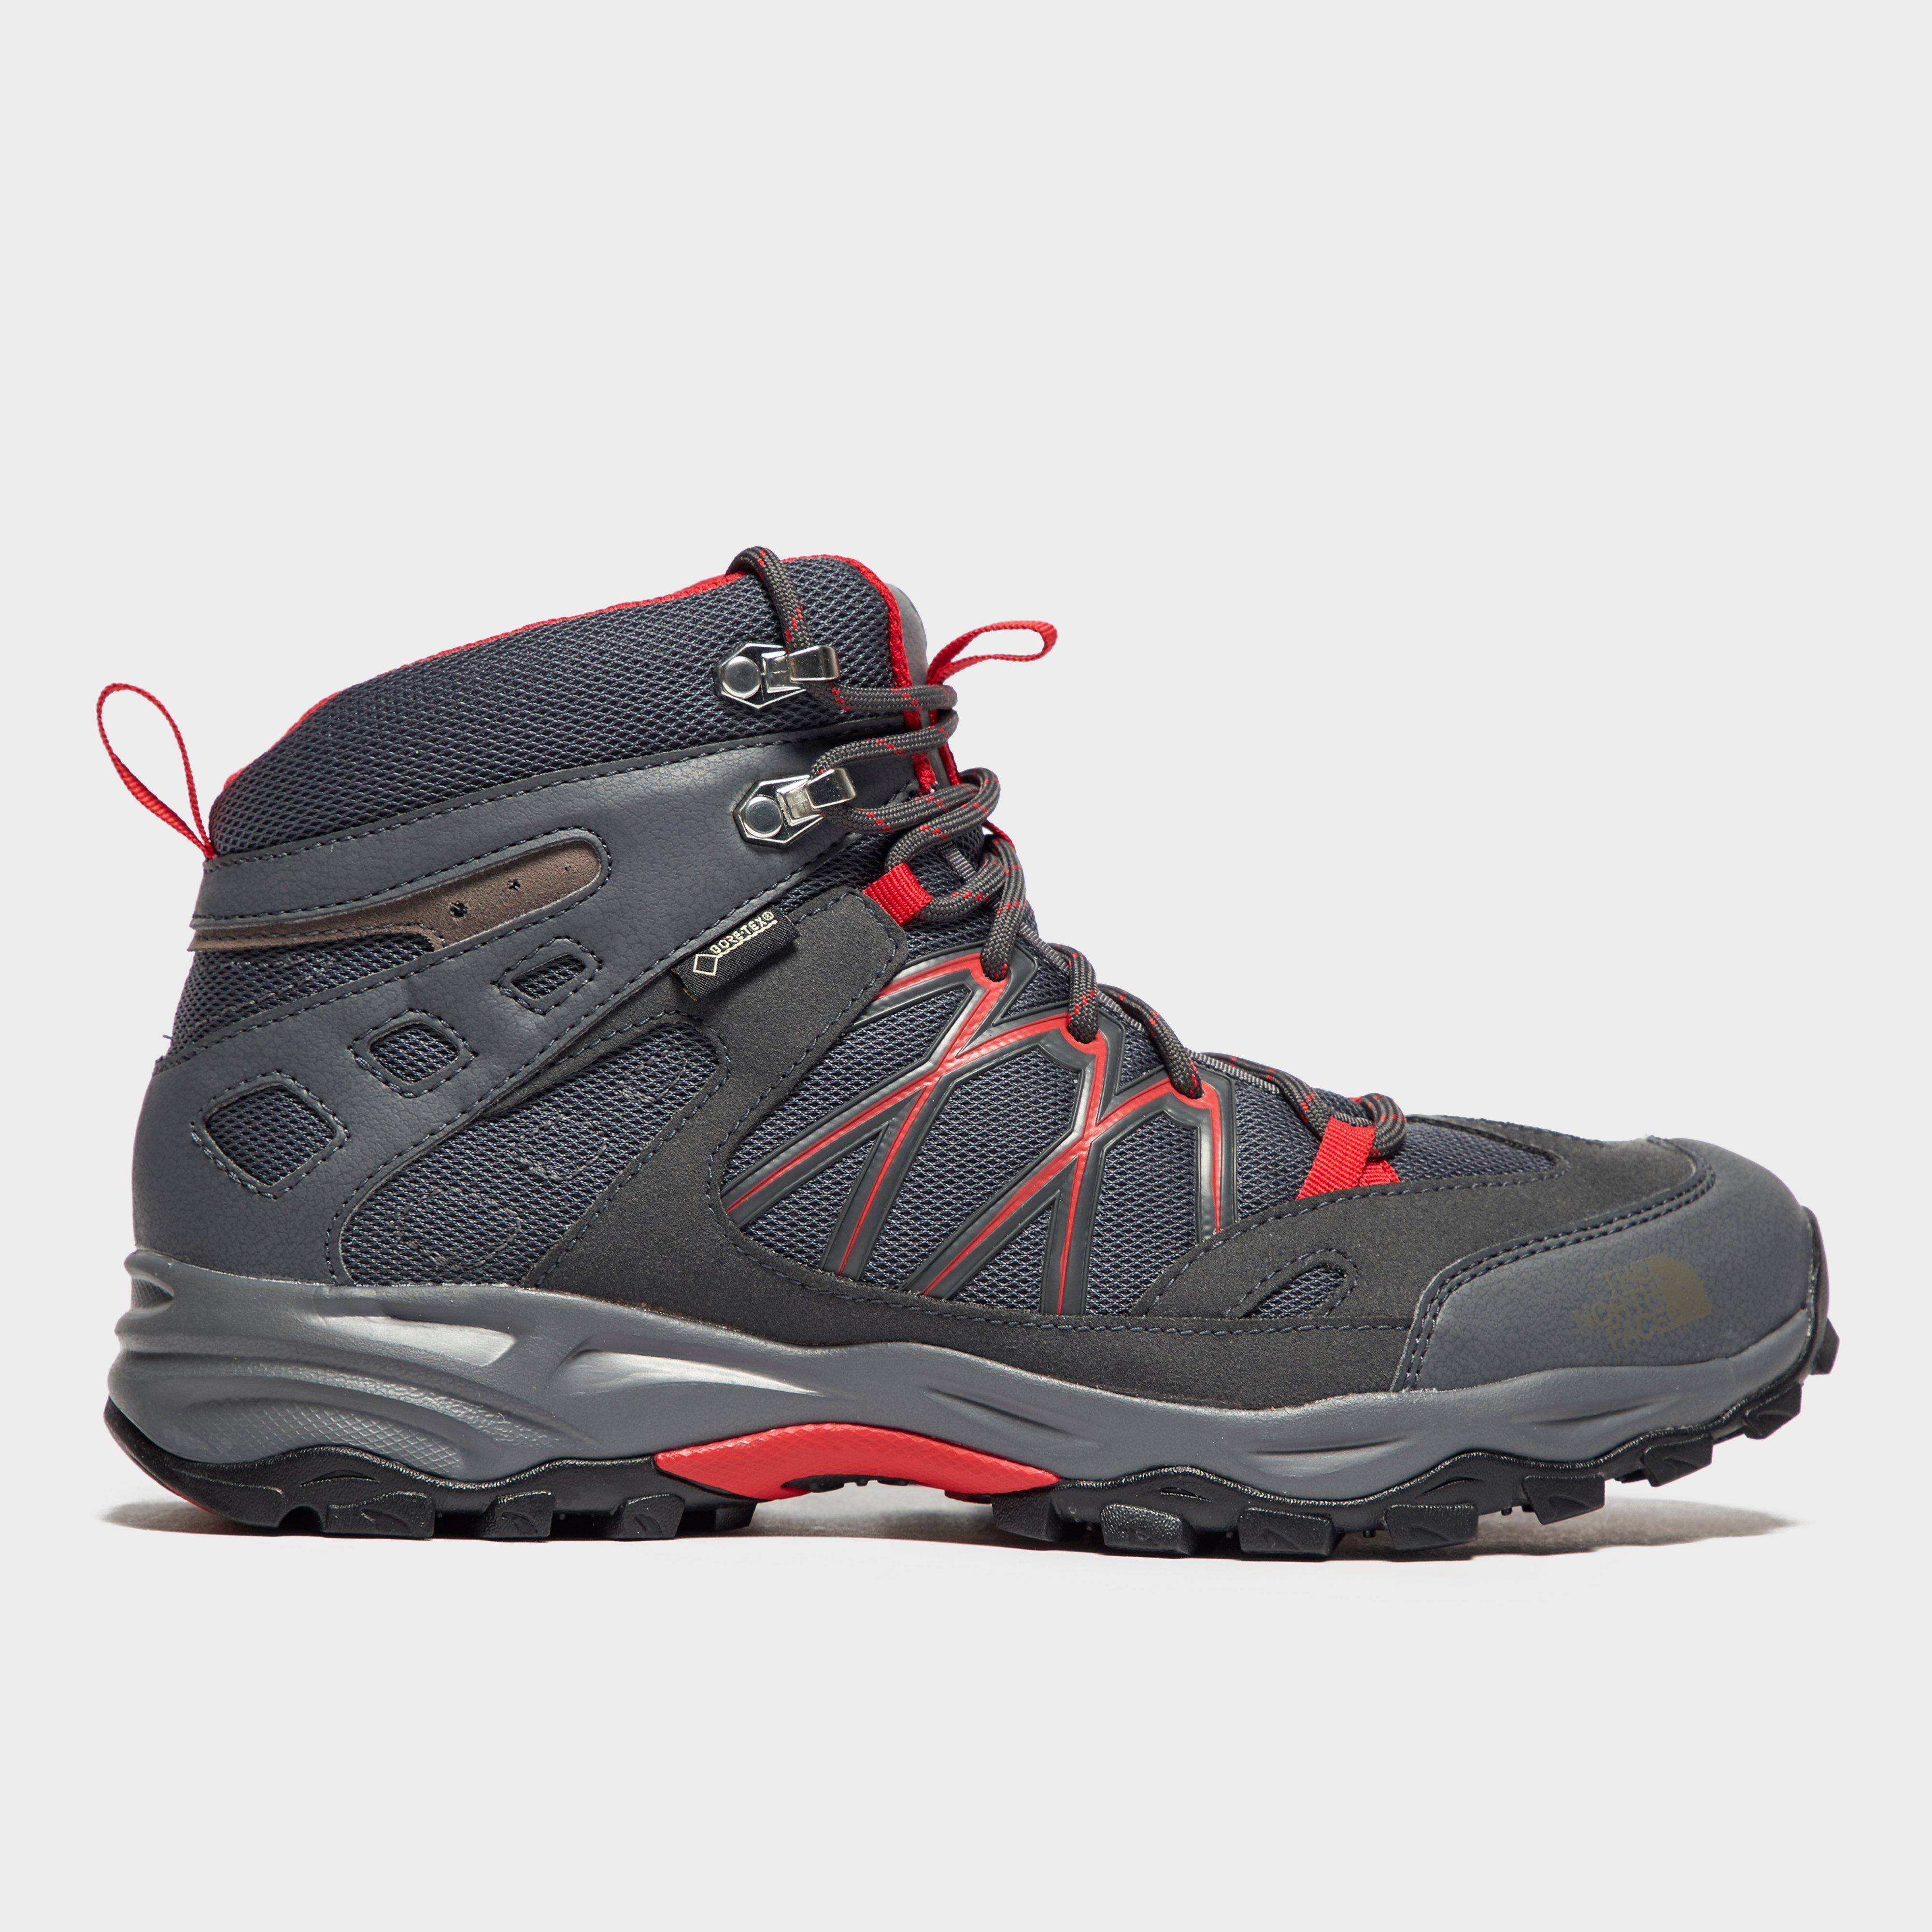 THE NORTH FACE Mens Terra Mid GORETEX Walking Boot